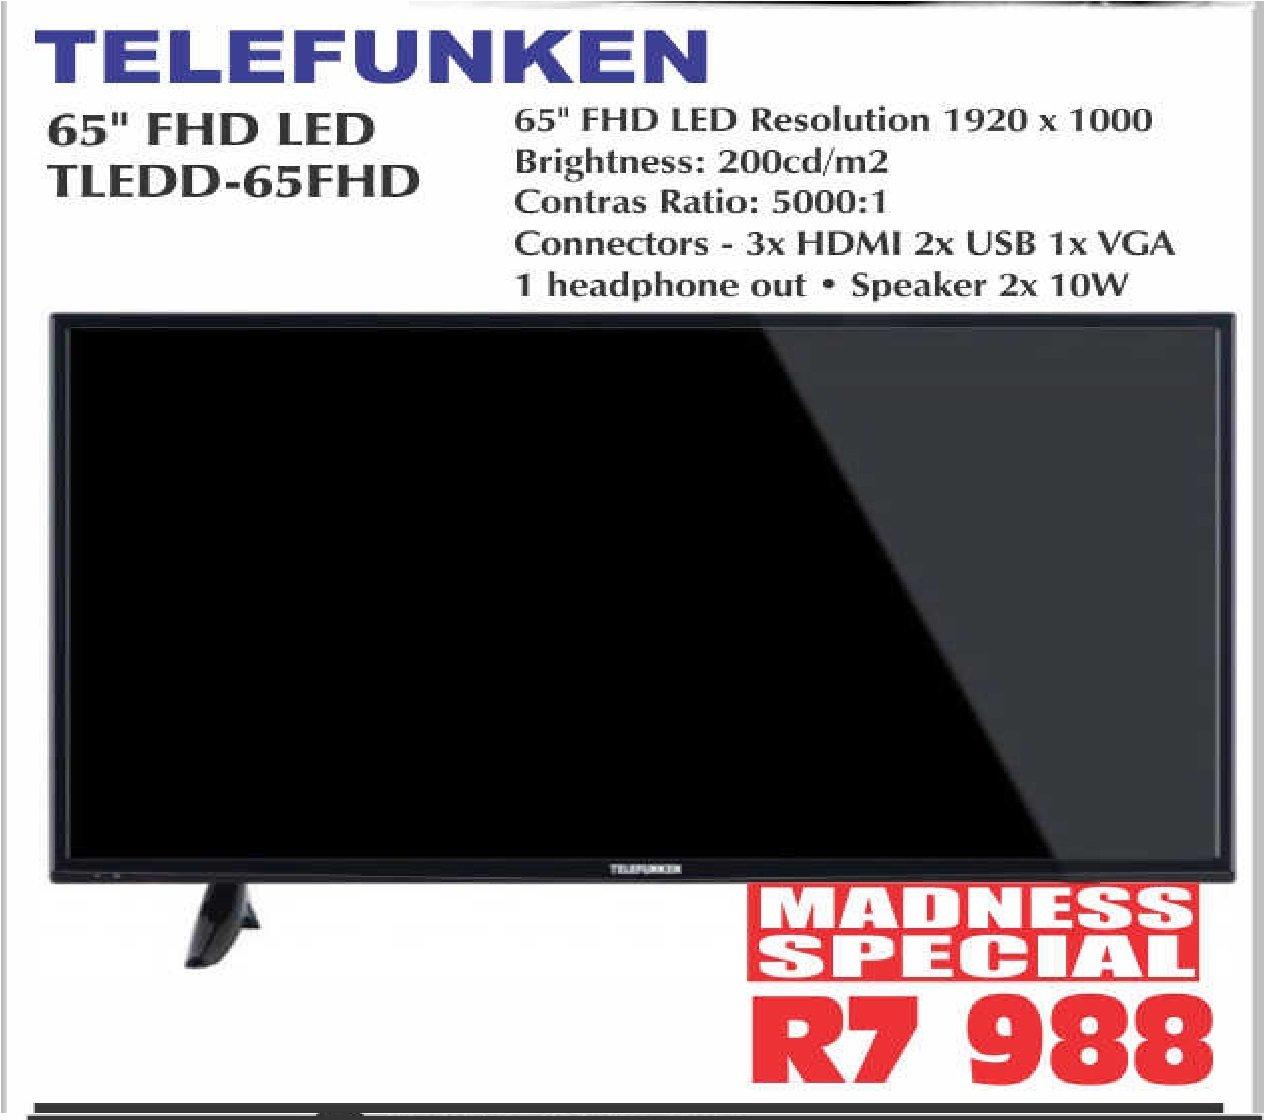 "TELEFUNKEN 65"" FHD LED TLEDD-65FHD"